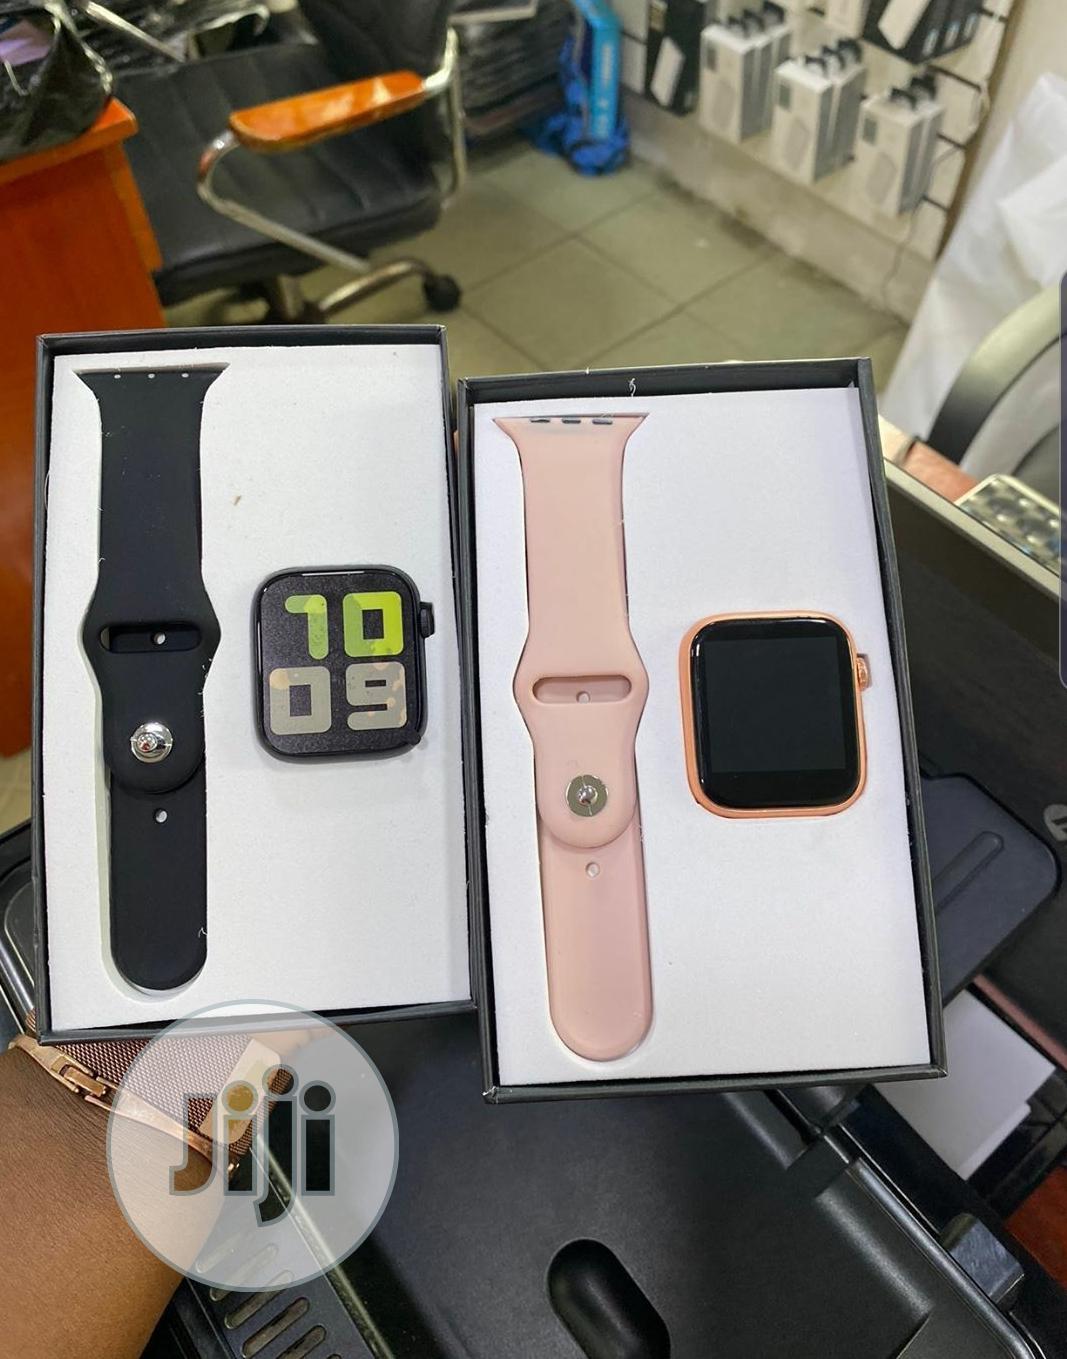 Full Touch Screen Sport Smartwatch